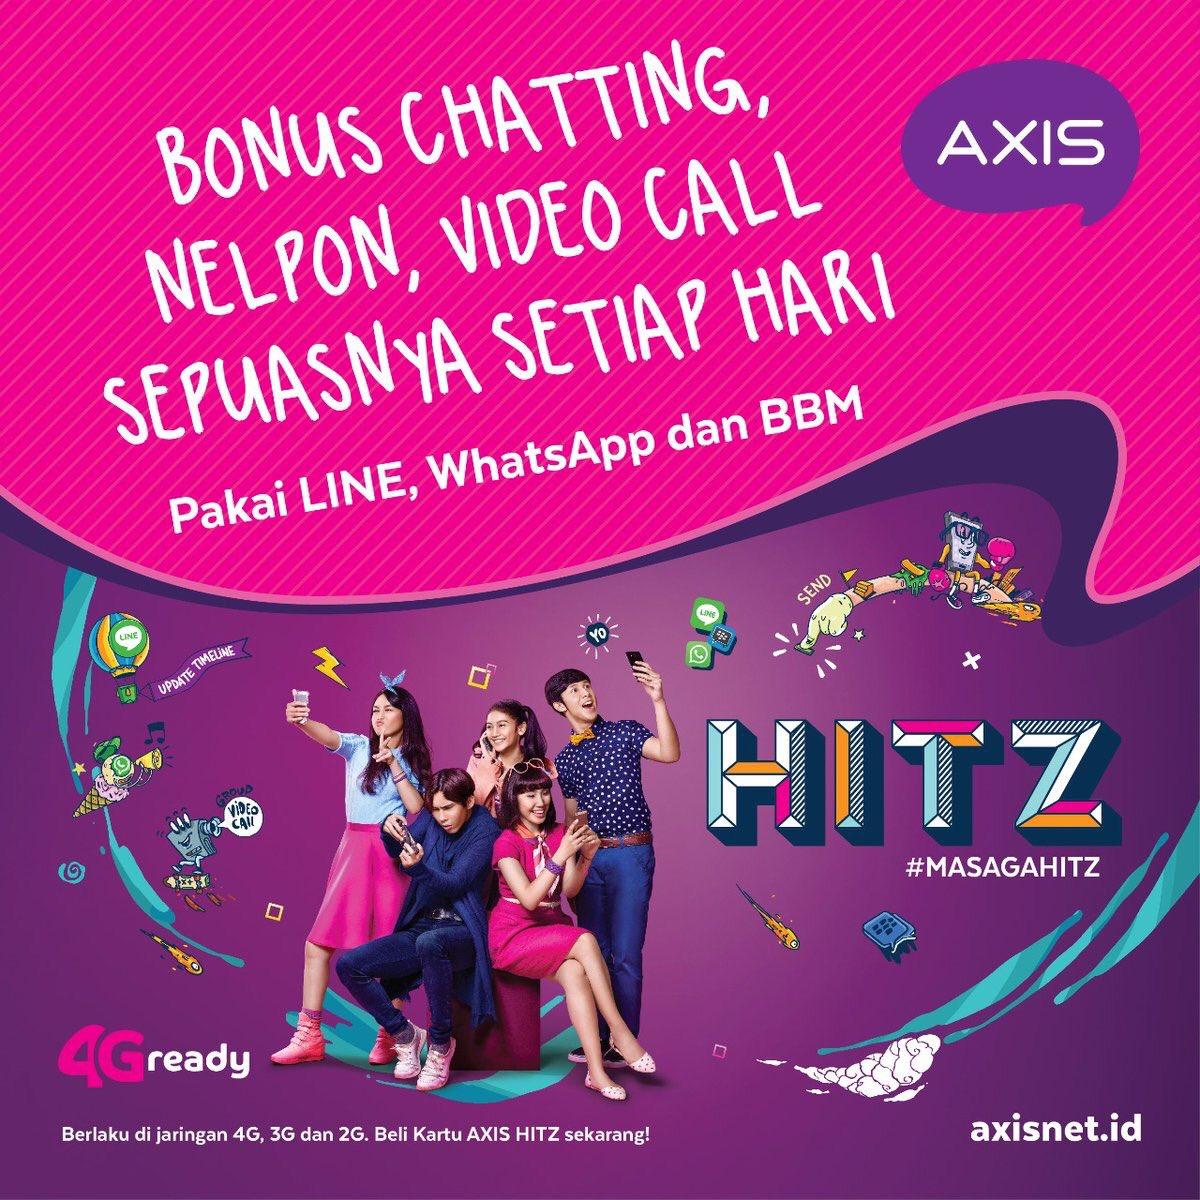 Youngontopcom On Twitter Chatting Nelpon Video Call Via Line Axis 4g Dan 3g Whatsapp Bbm Sepuasnya Kuota Tak Tersentuh Beli Kartu Hitz Ditoko Pulsa Terdekat